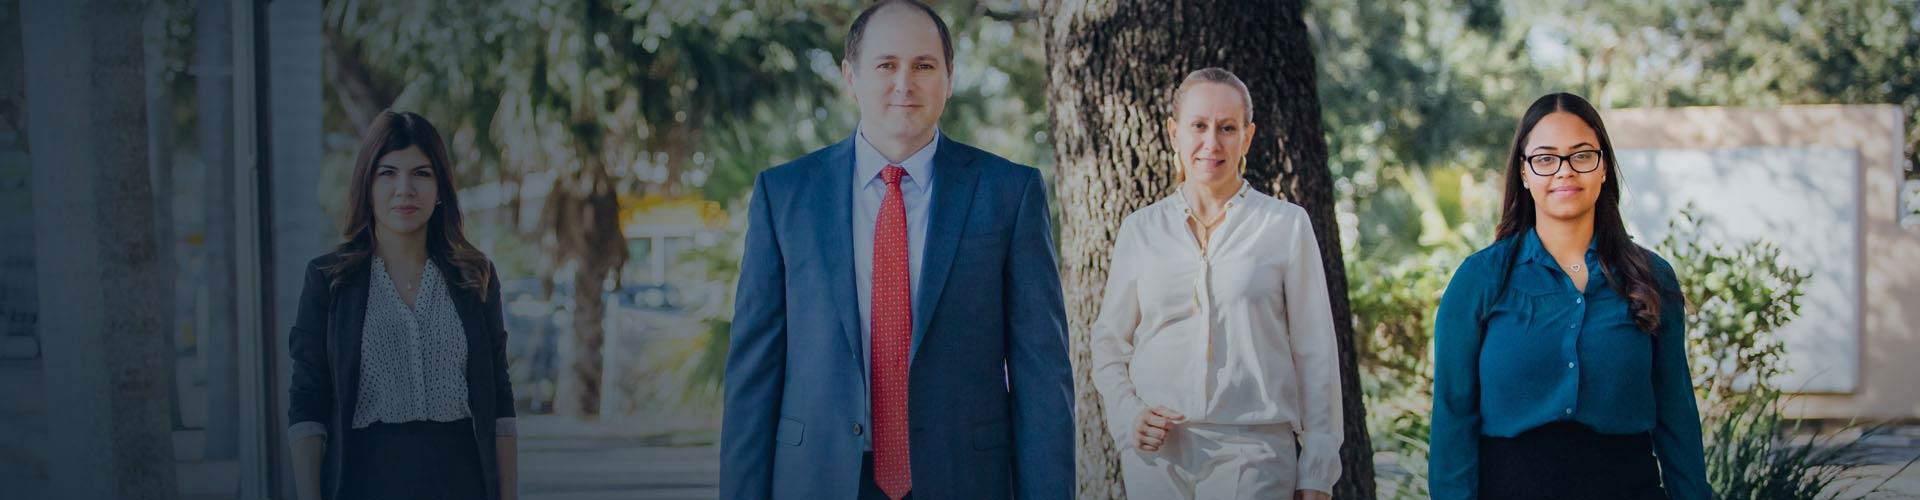 Broward Debt Consolidation Attorneys - Stiberman Law Firm